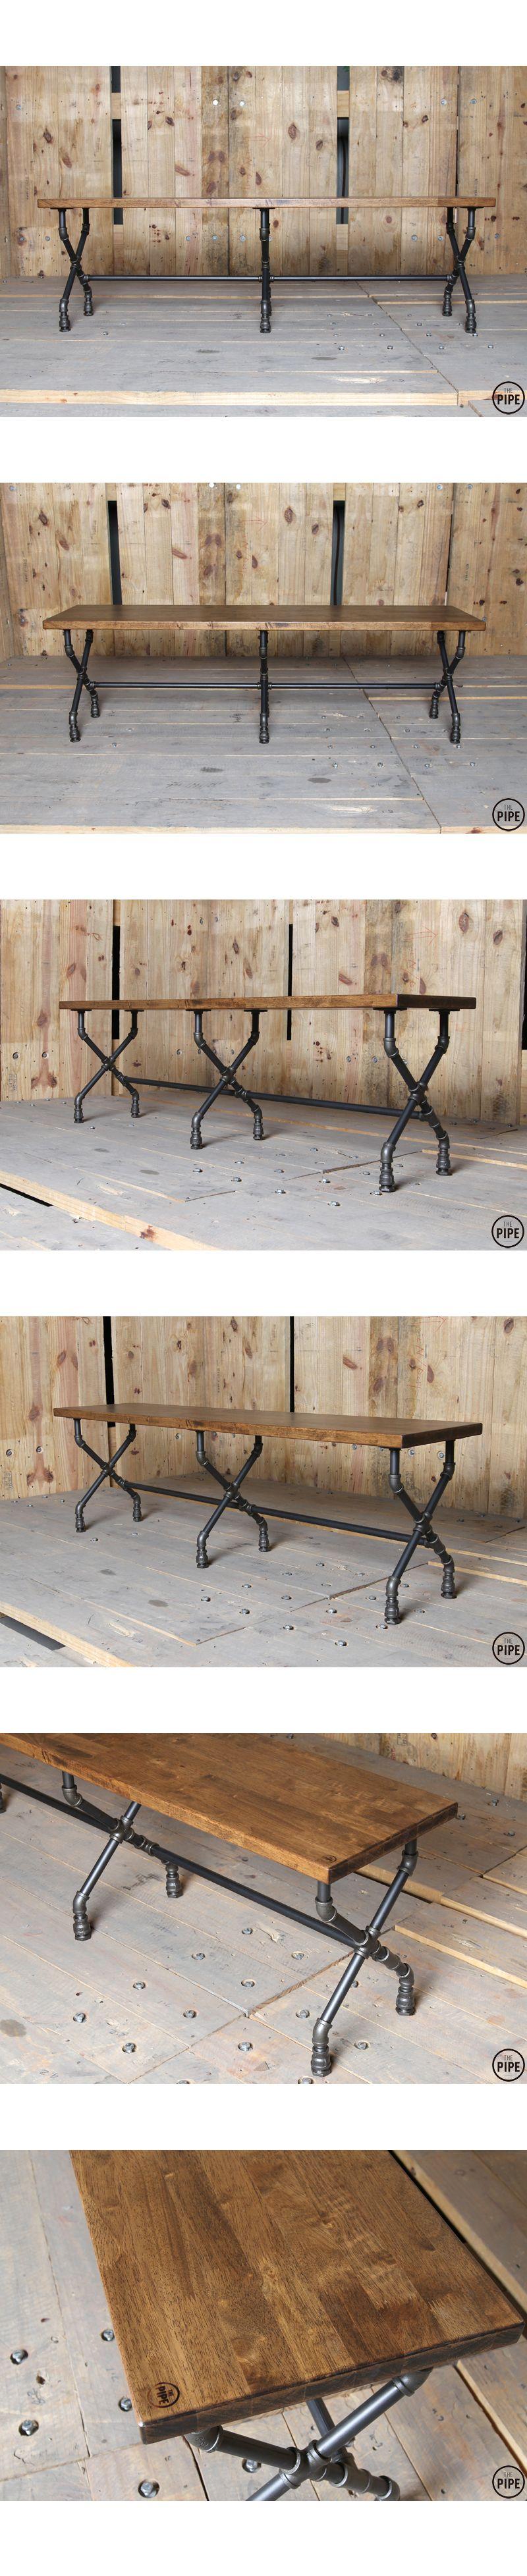 The Pipe:: 15SG Dining Table or Work Table  DIY bar  Pinterest  파이프, 의자 ...